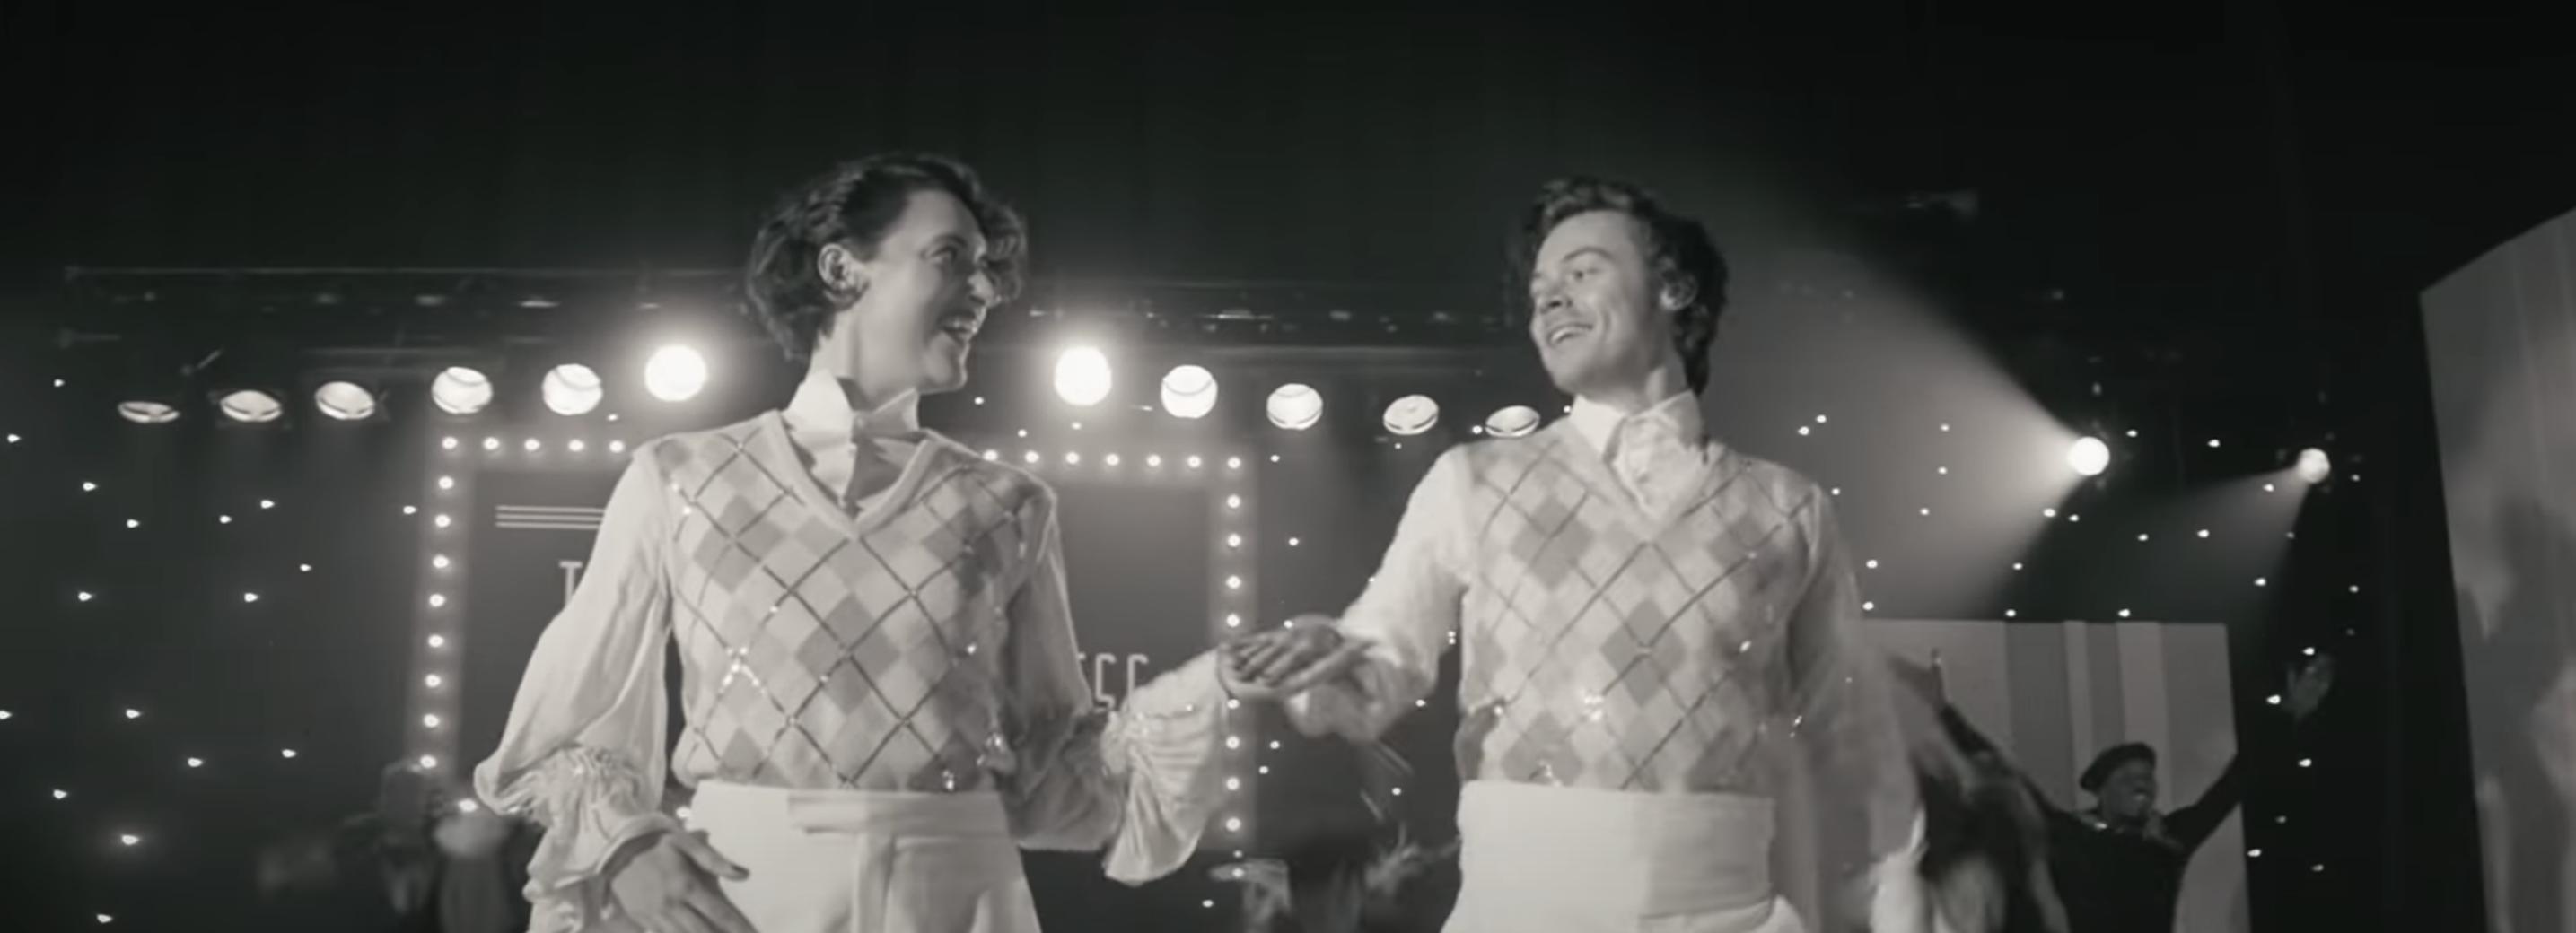 Watch Harry Styles, Phoebe Waller-Bridge in 'Treat People Kindly'